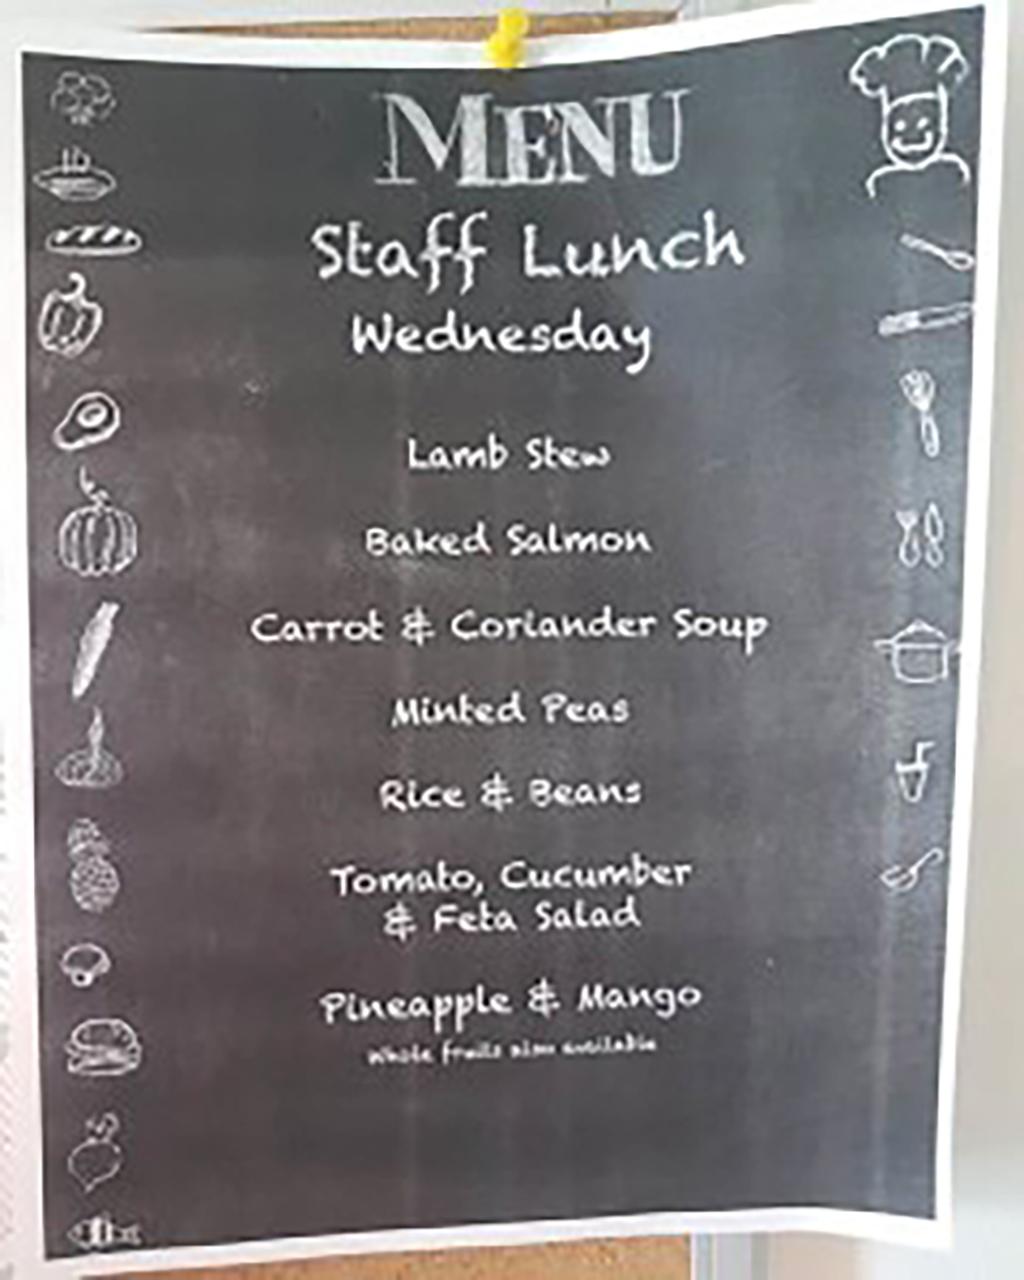 A staff lunch menu on Necker Island